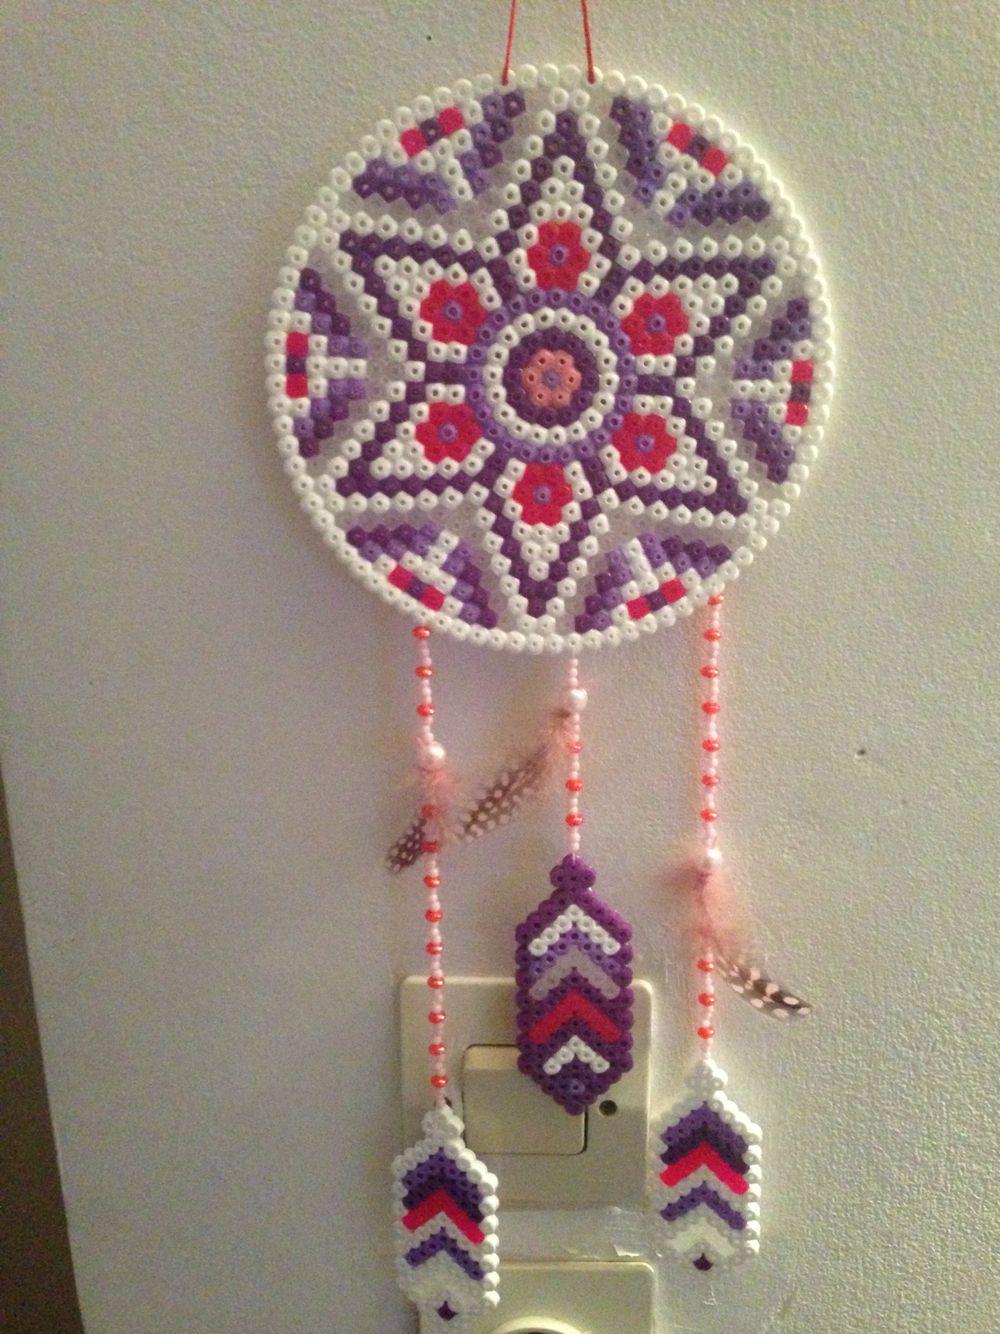 attrape reve perles hama pinterest beads hama beads and perler beads. Black Bedroom Furniture Sets. Home Design Ideas